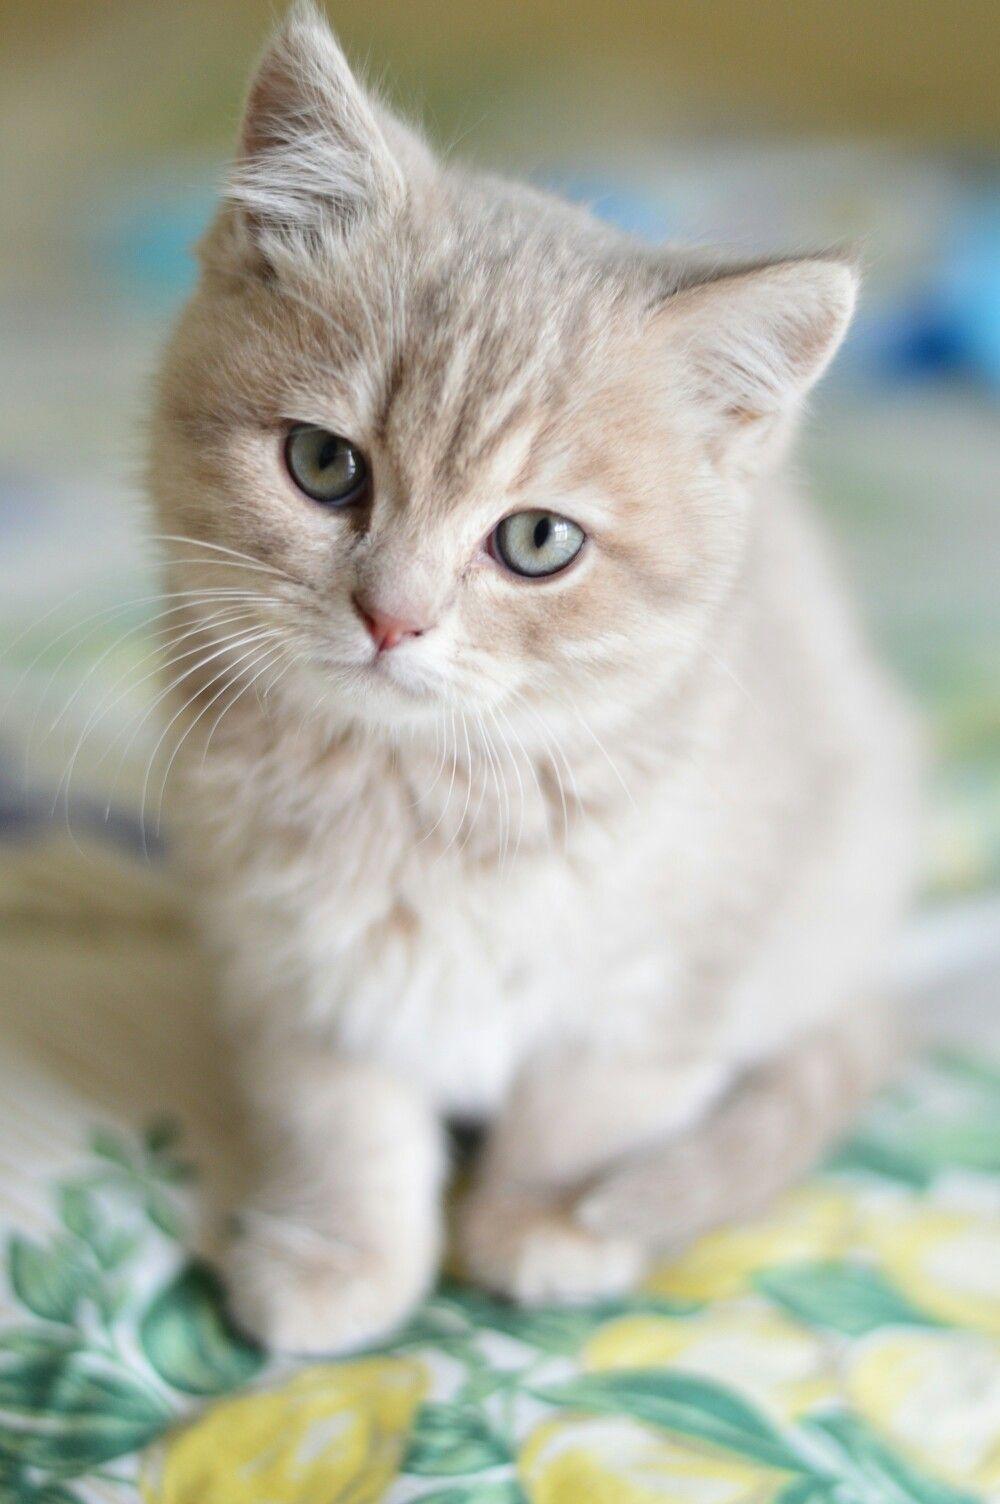 Medium Of Cat Peeing On Bed